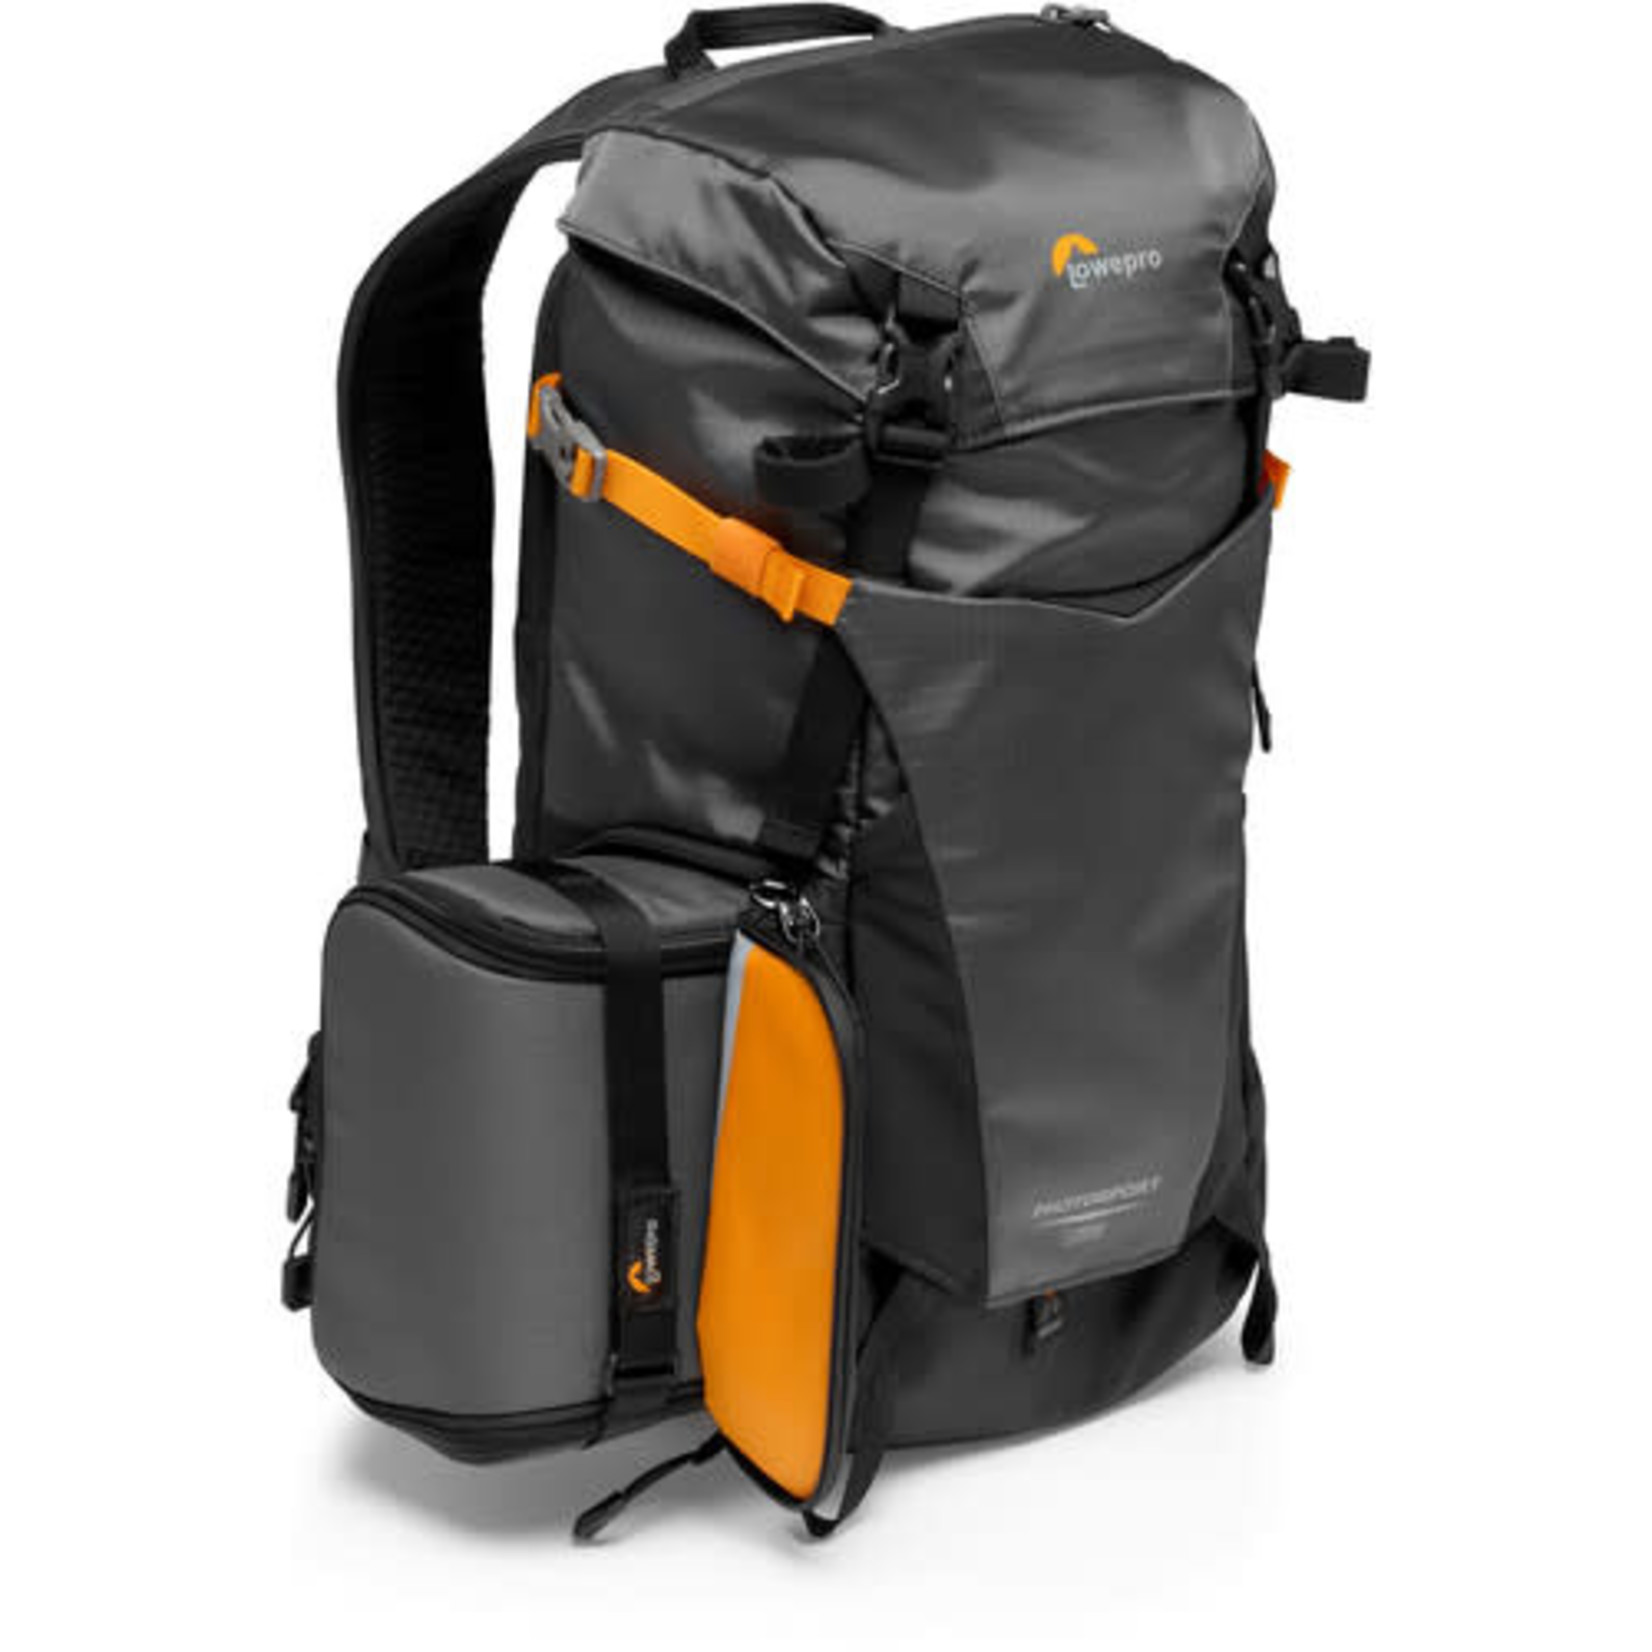 Lowepro Lowepro PhotoSport BP 15L AW III Photo Backpack (Gray/Black)